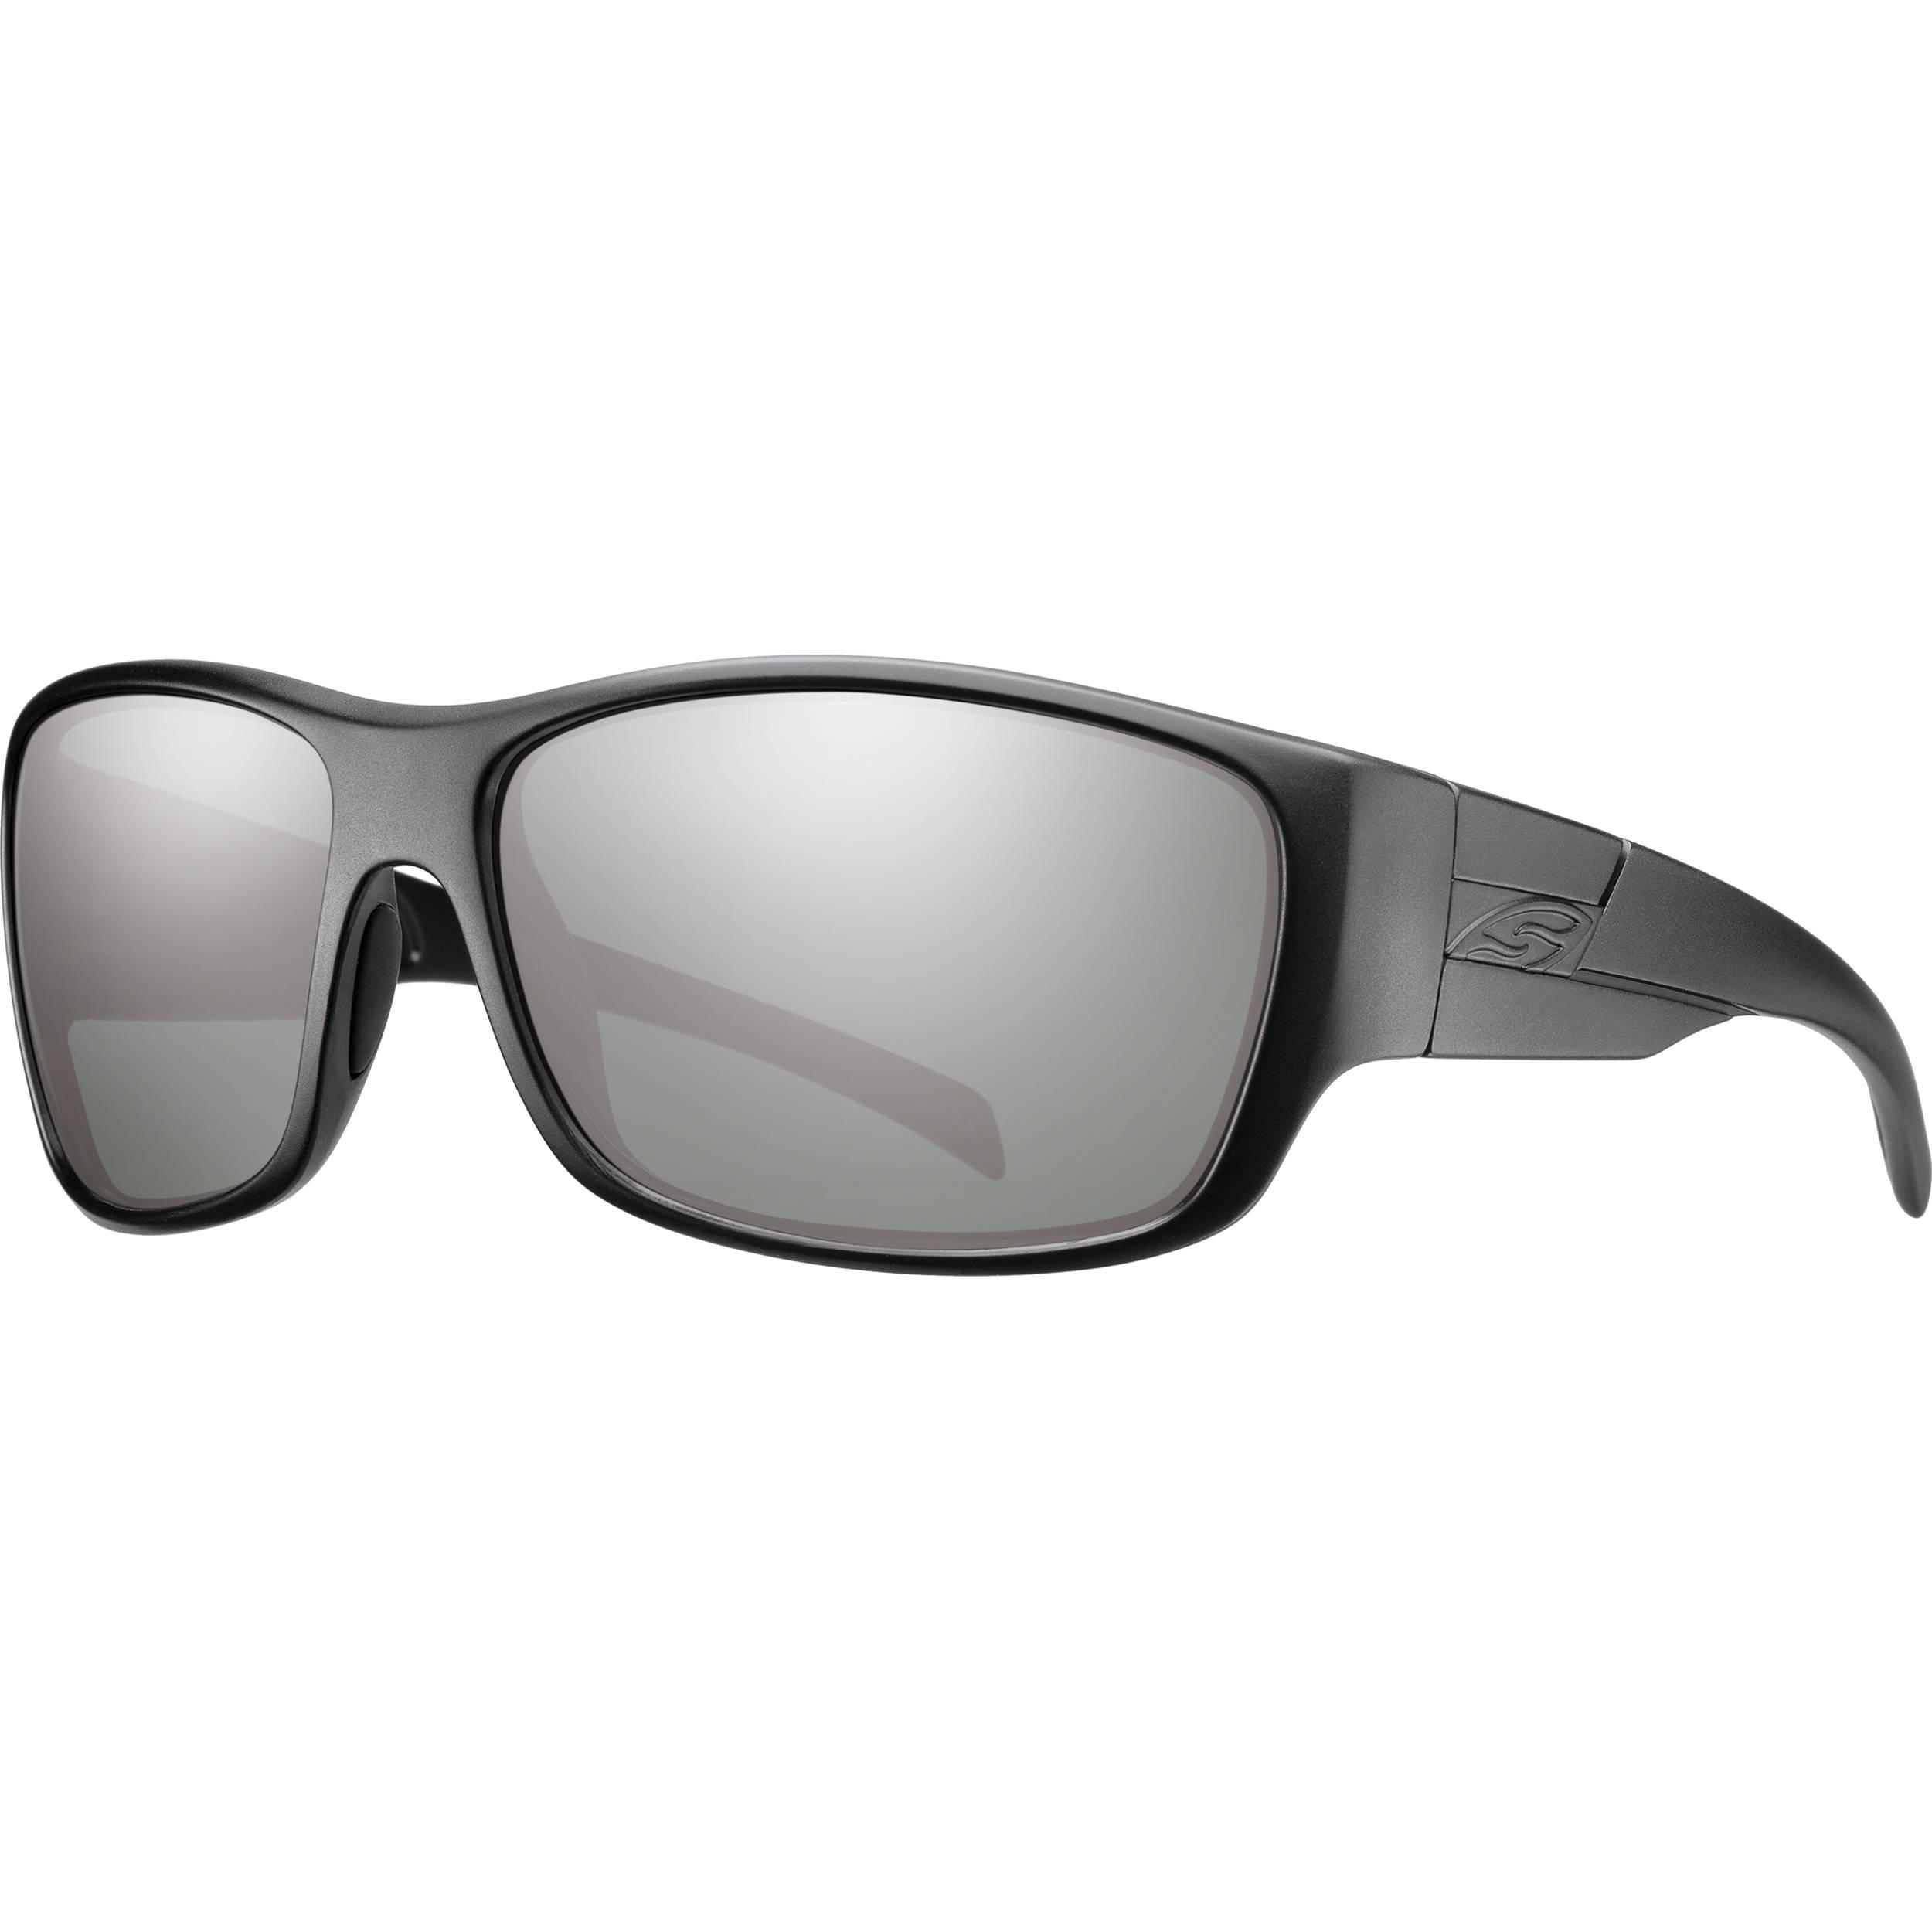 99c242dfbc8db Smith Optics Frontman Elite Ballistic Sunglasses FNTRPGYMBK on PopScreen